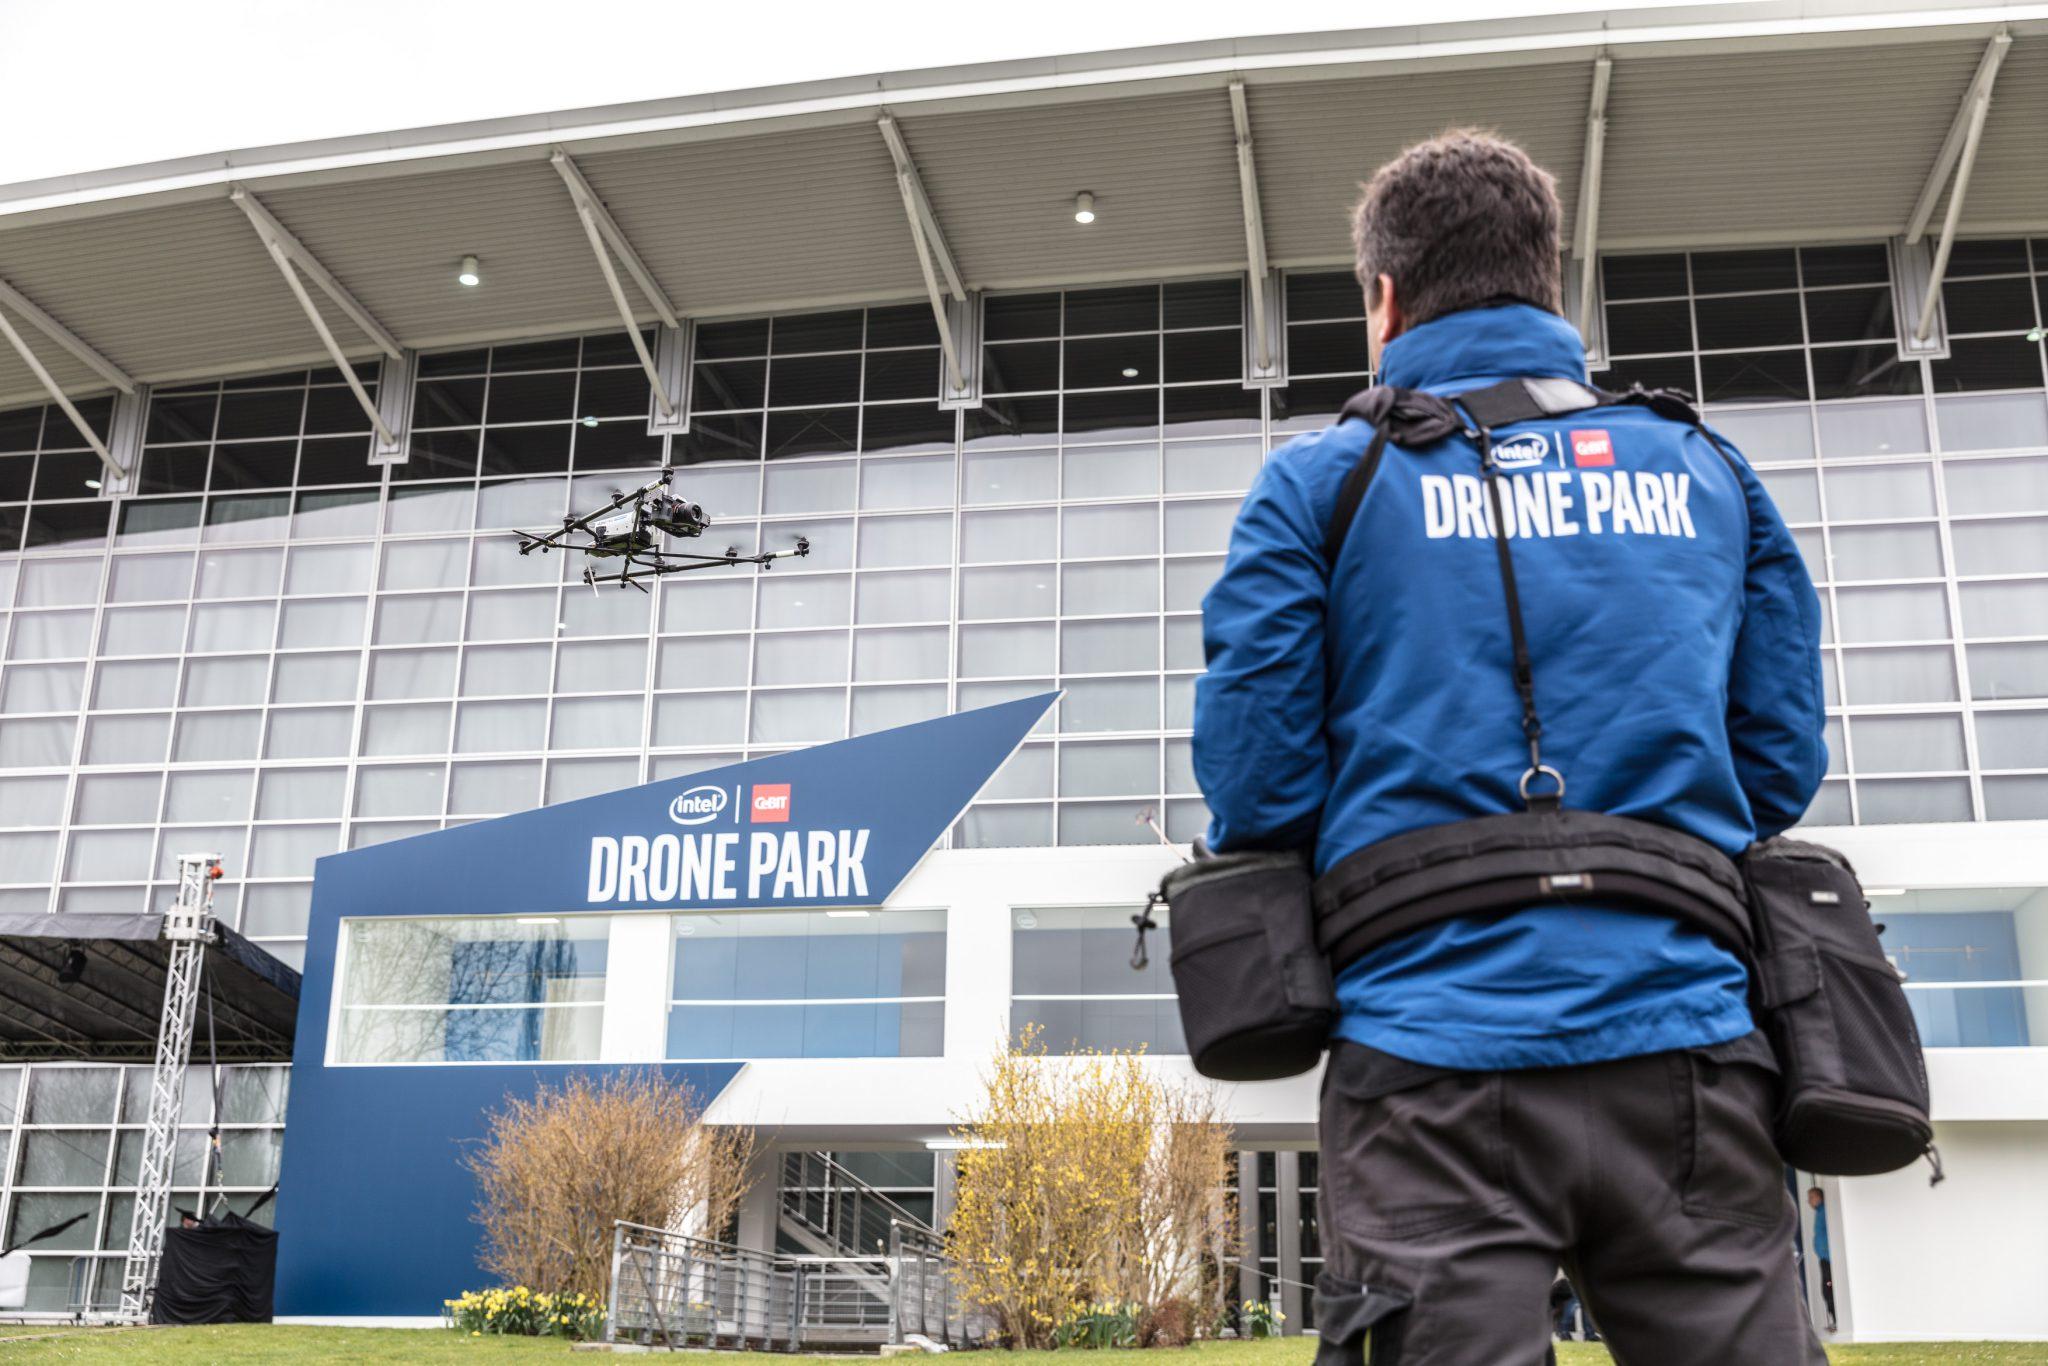 Intel Drohnen Park